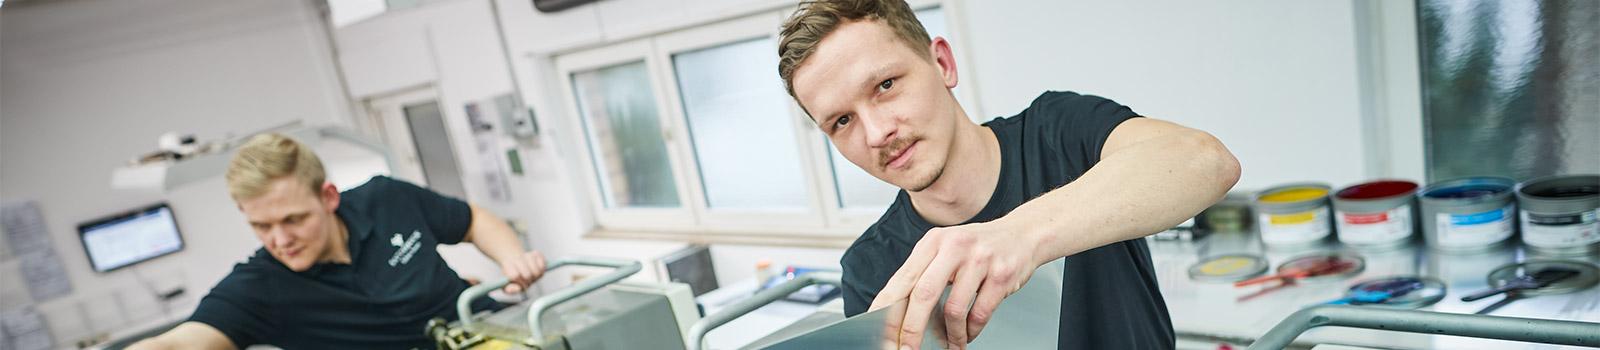 Druckverfahren in der Druckerei Satzdruck in Coesfeld